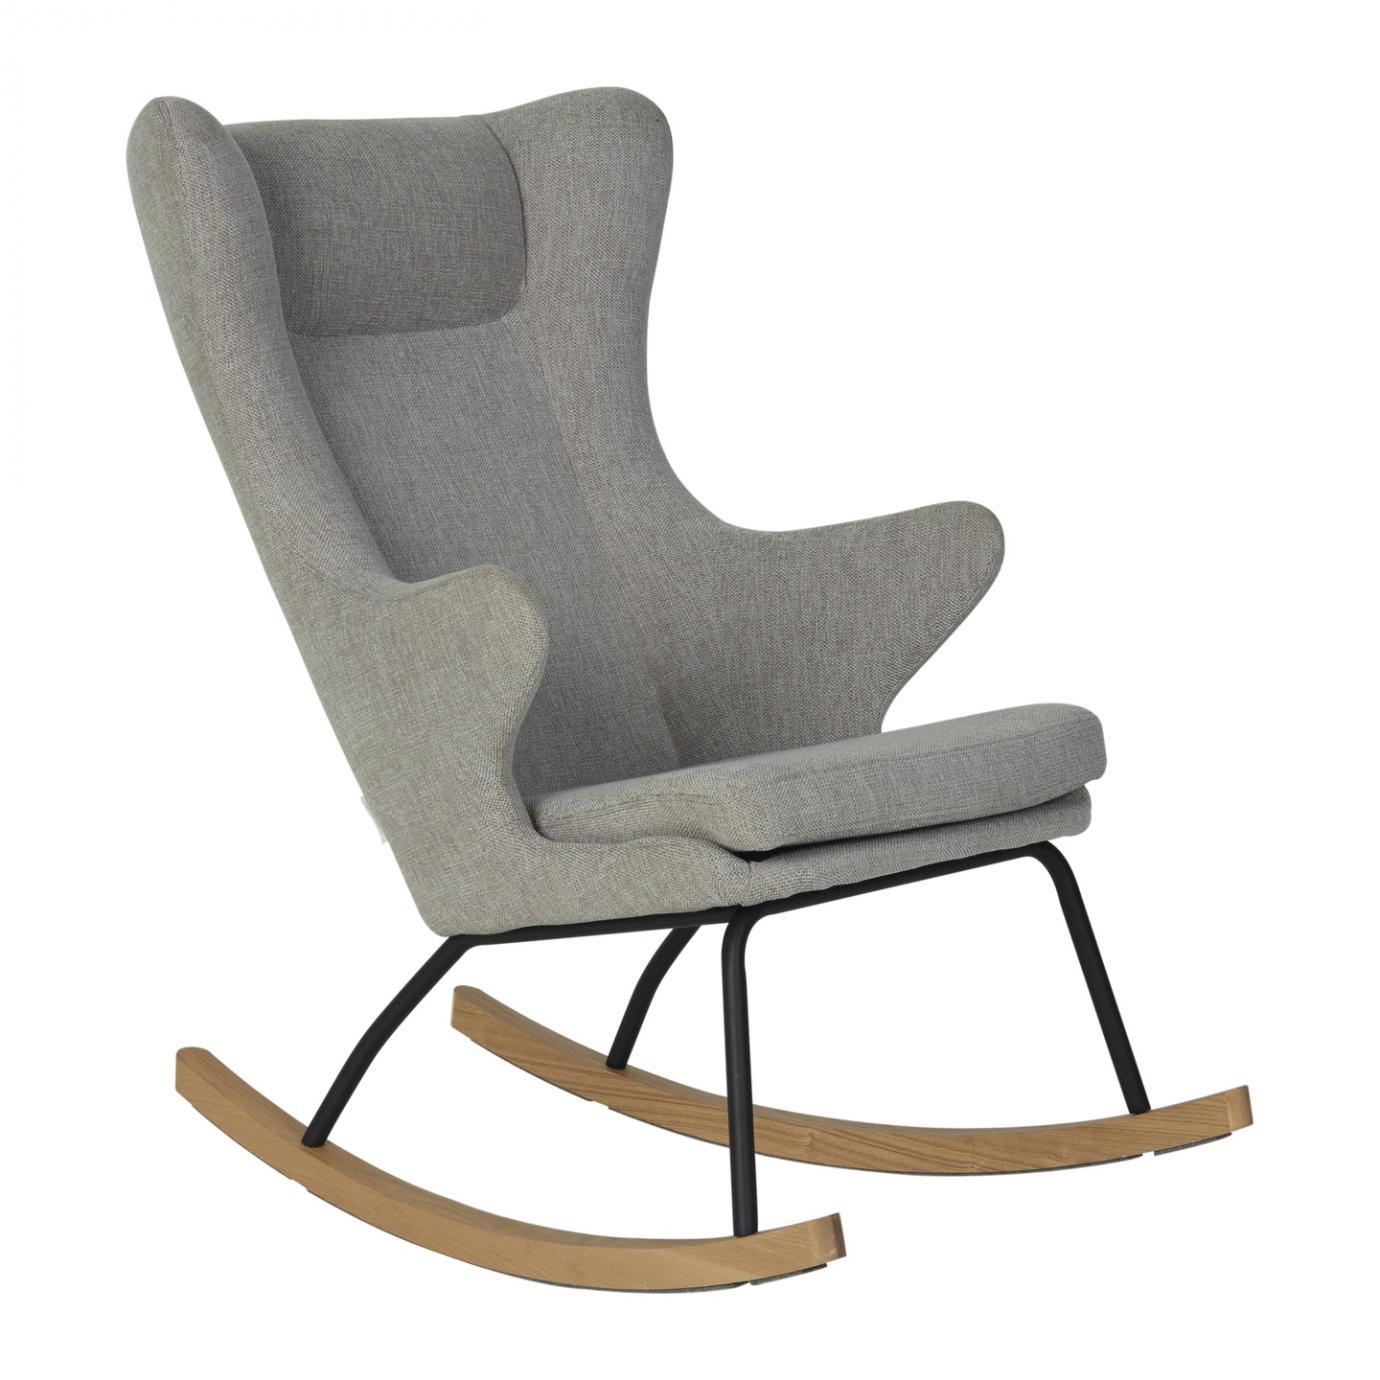 fauteuil a bascule adulte de luxe sand